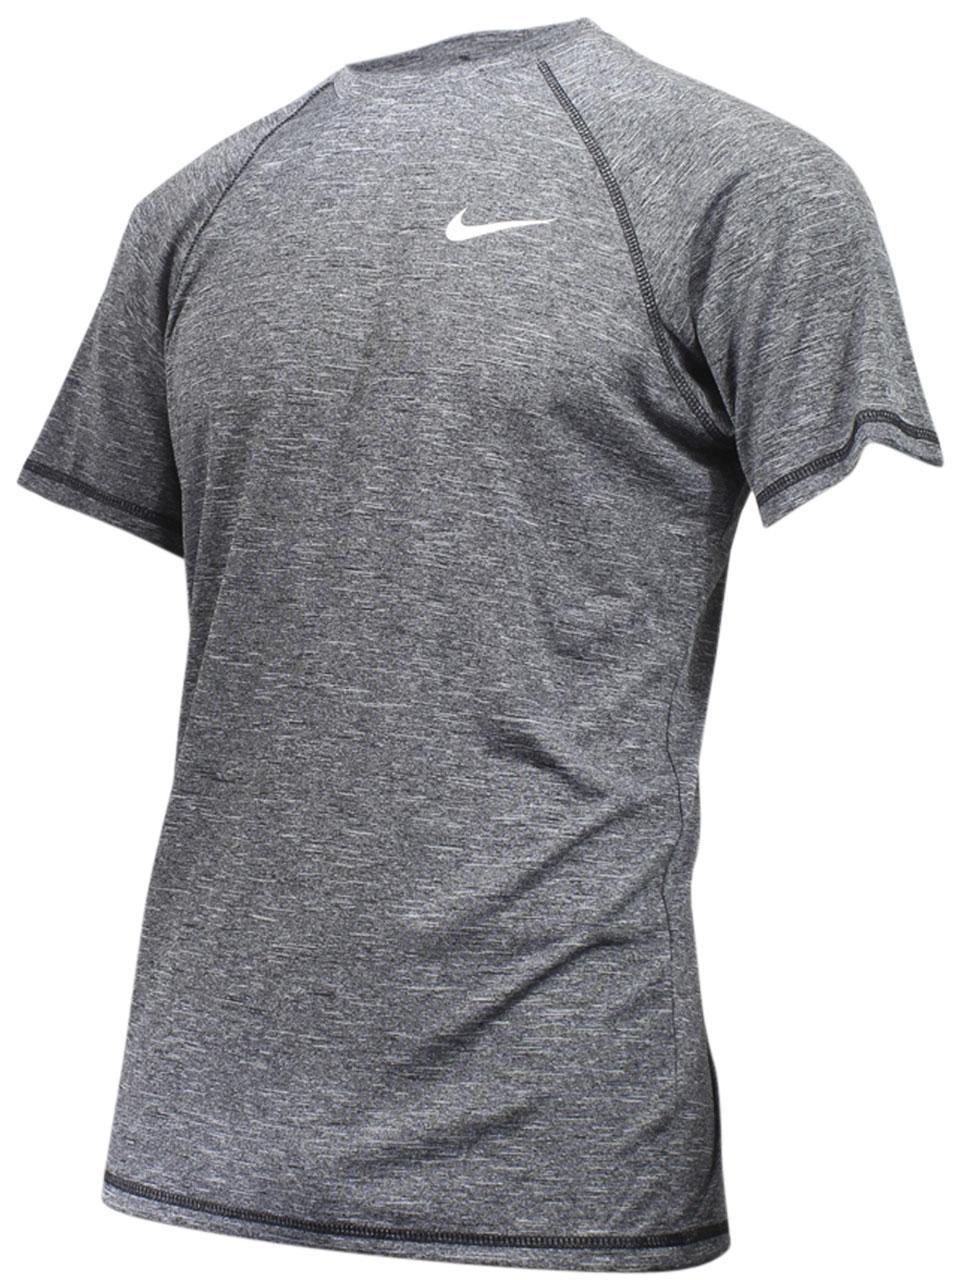 ee316f81f Nike Men's Heather Short Sleeve Hydroguard Shirt Swimwear | eBay